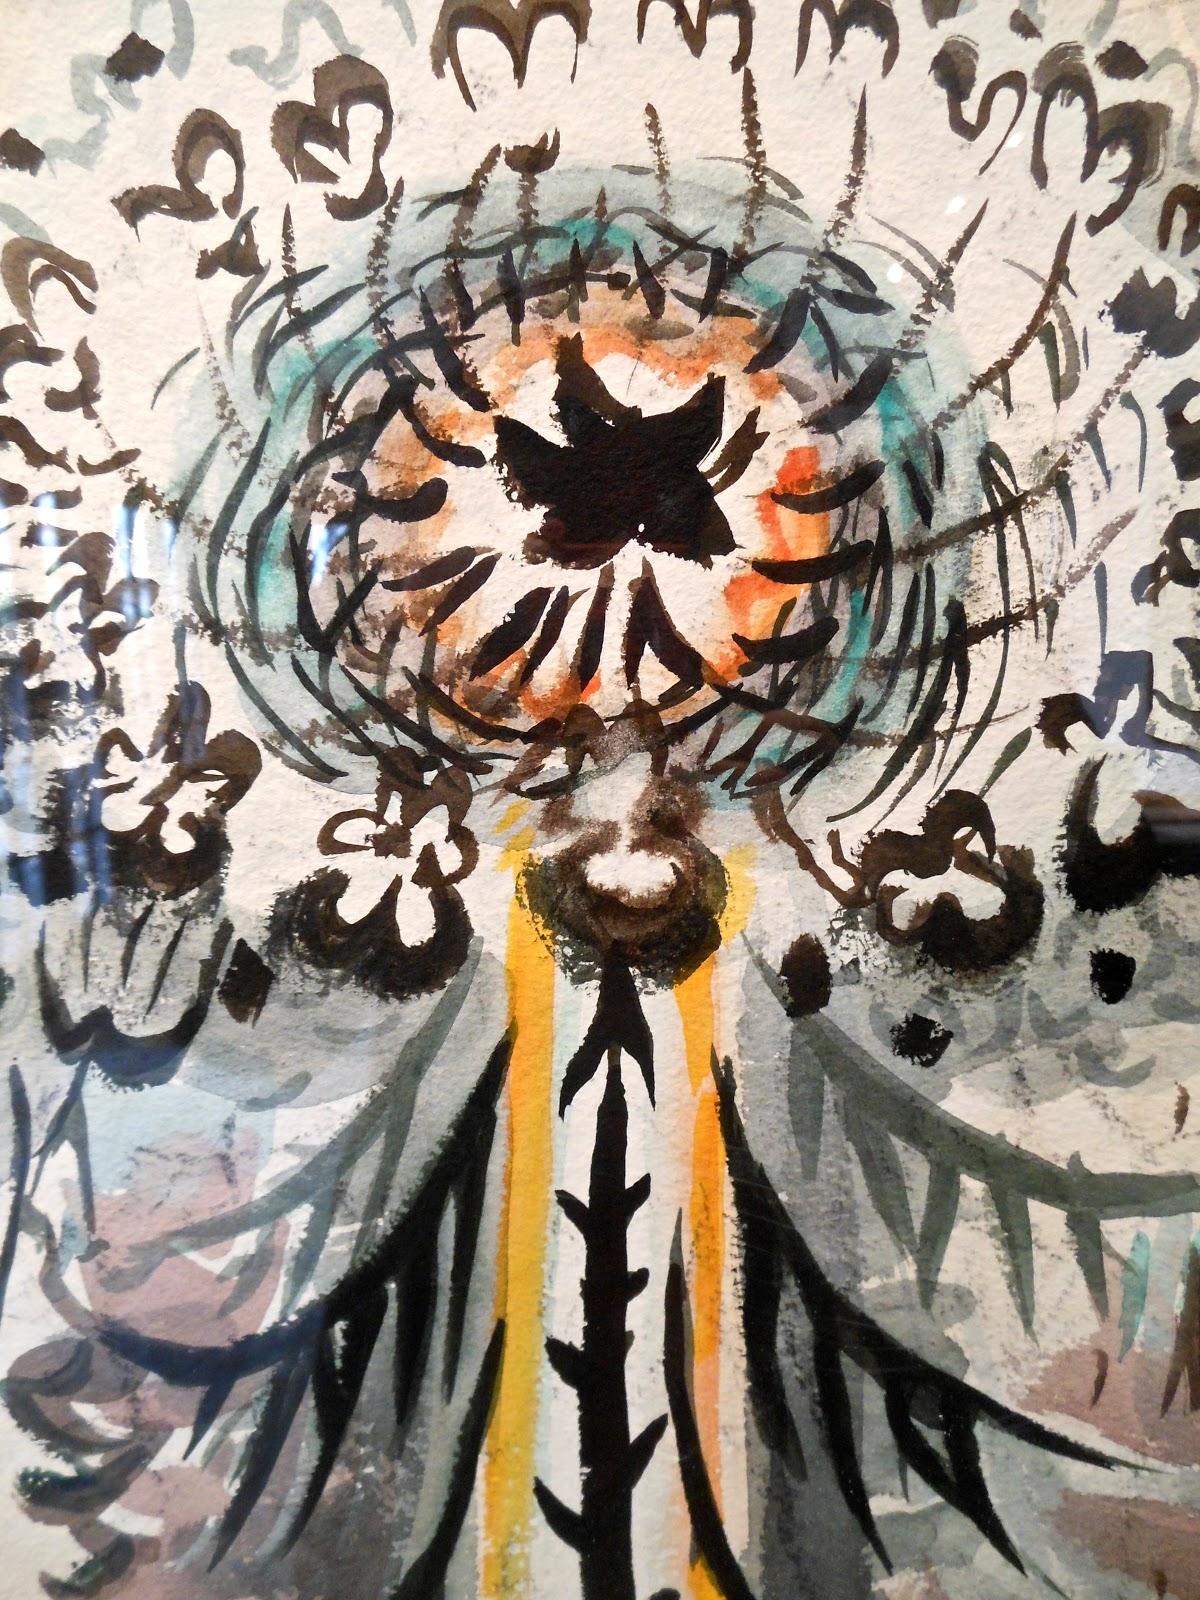 charles burchfield art - milk  - ☆ Milk ☆ 平平。淡淡。也是真。